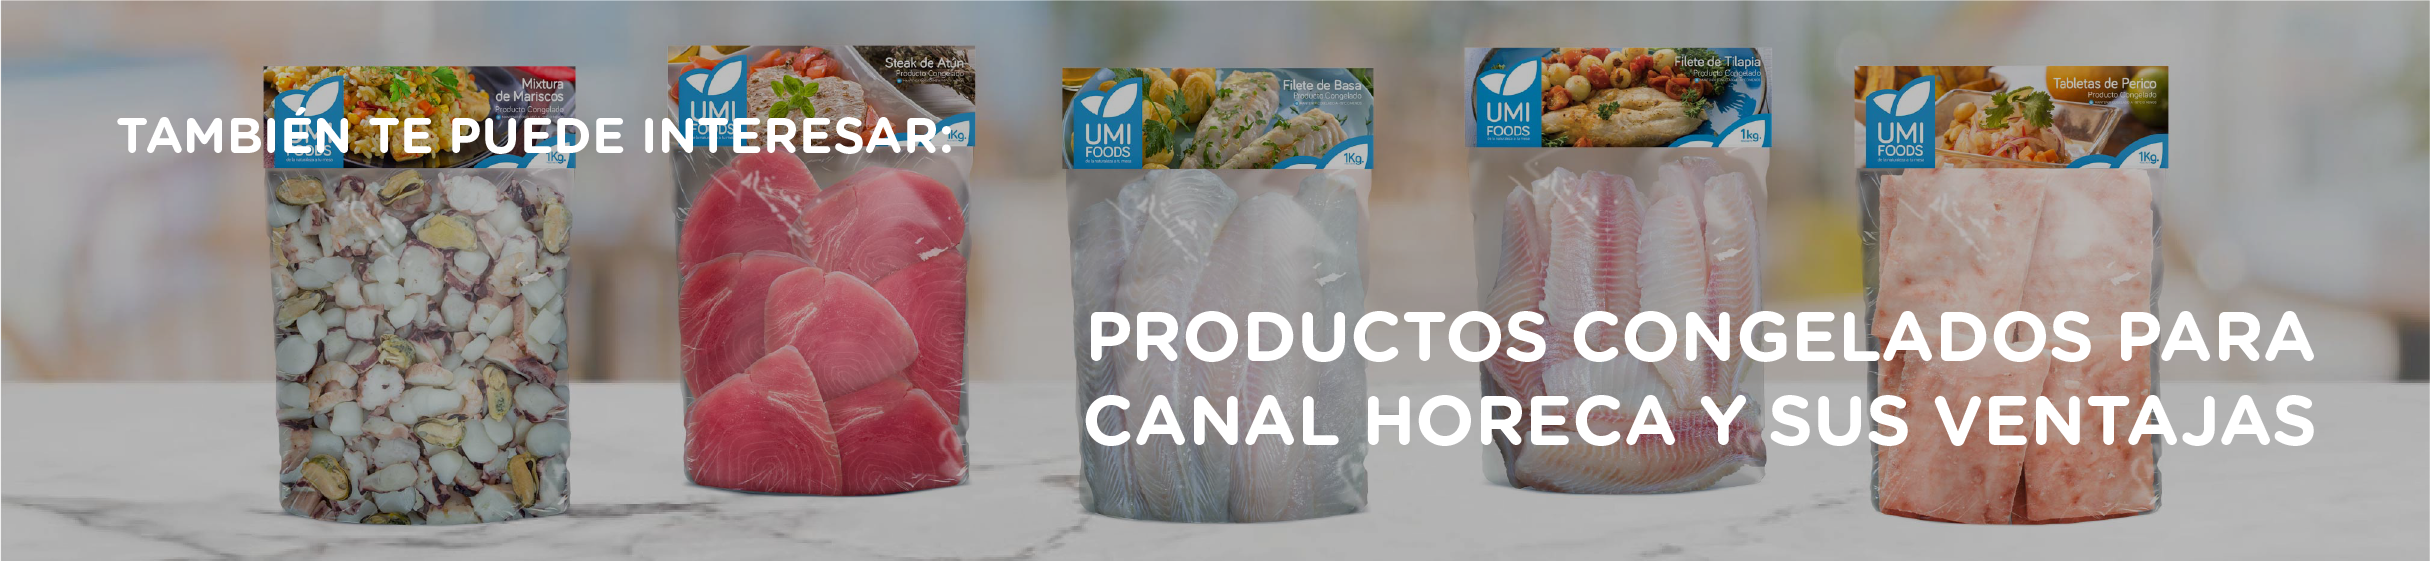 productos-congelados-canal-horeca